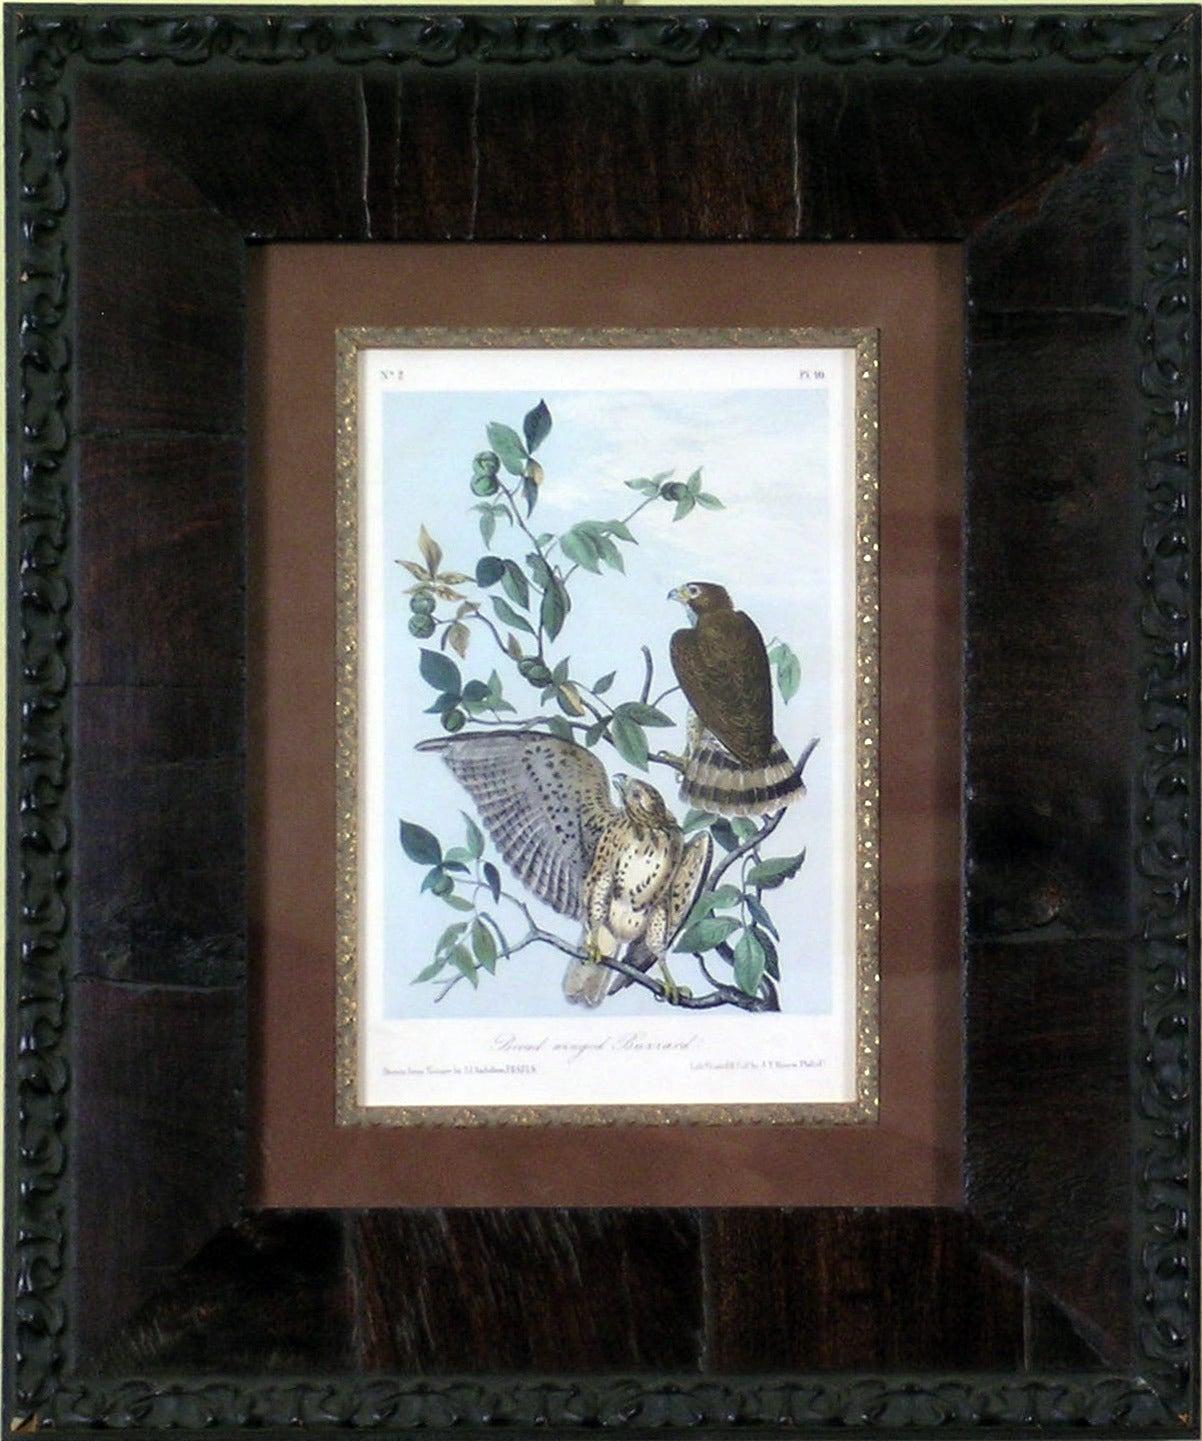 Broad Winged Buzzard - Print by John James Audubon